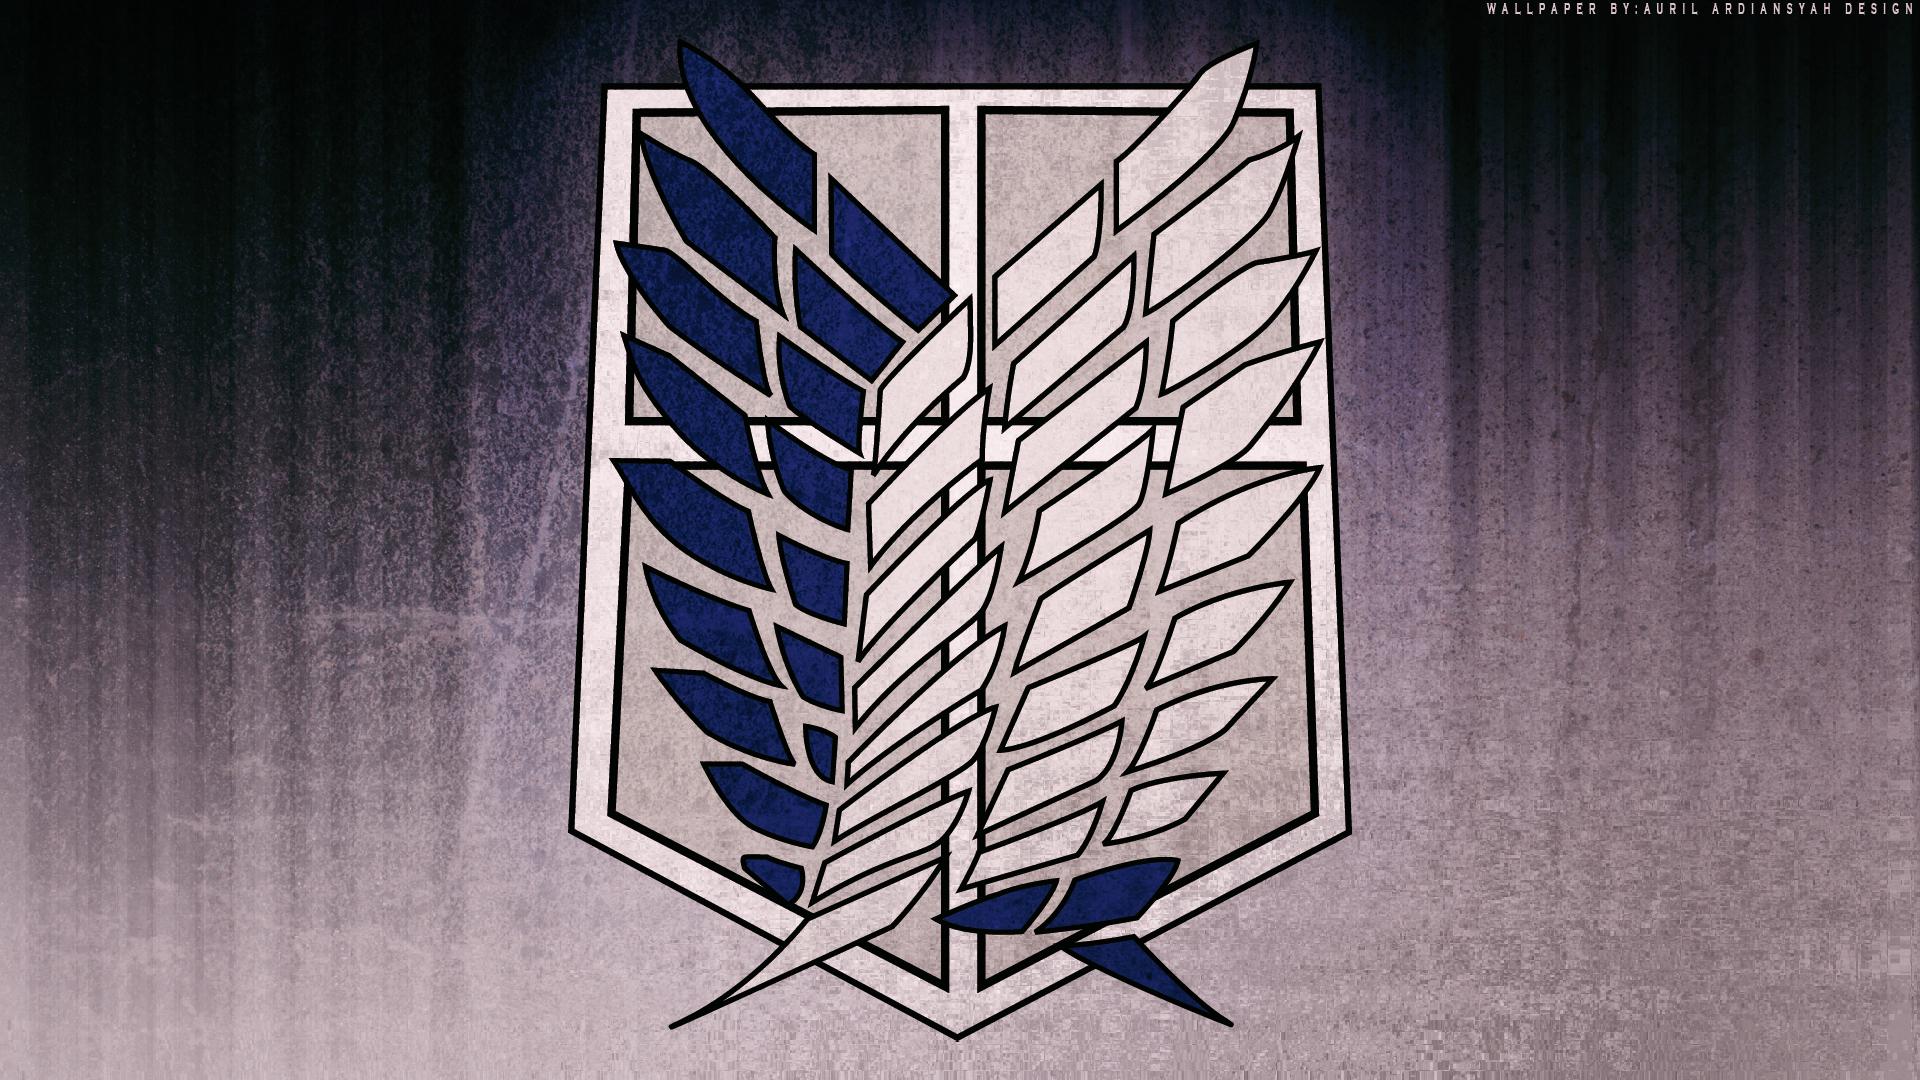 Attack On Titan Scouting Legion Wallpaper Resolution 1920x1080 Id 741594 Wallha Com